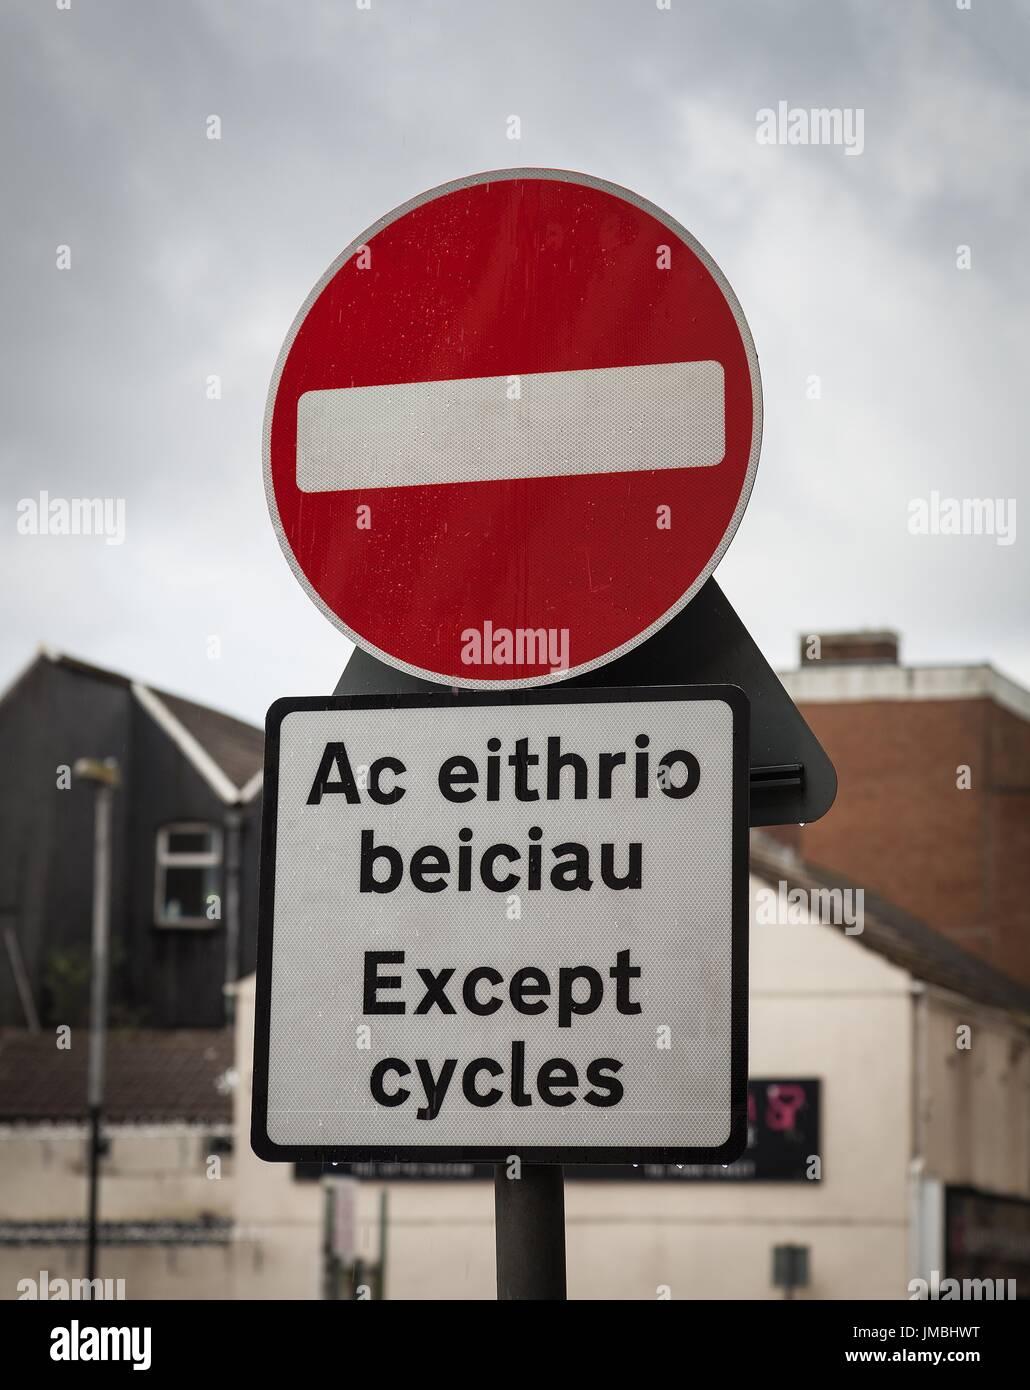 Bilingual No Entry sign - Stock Image